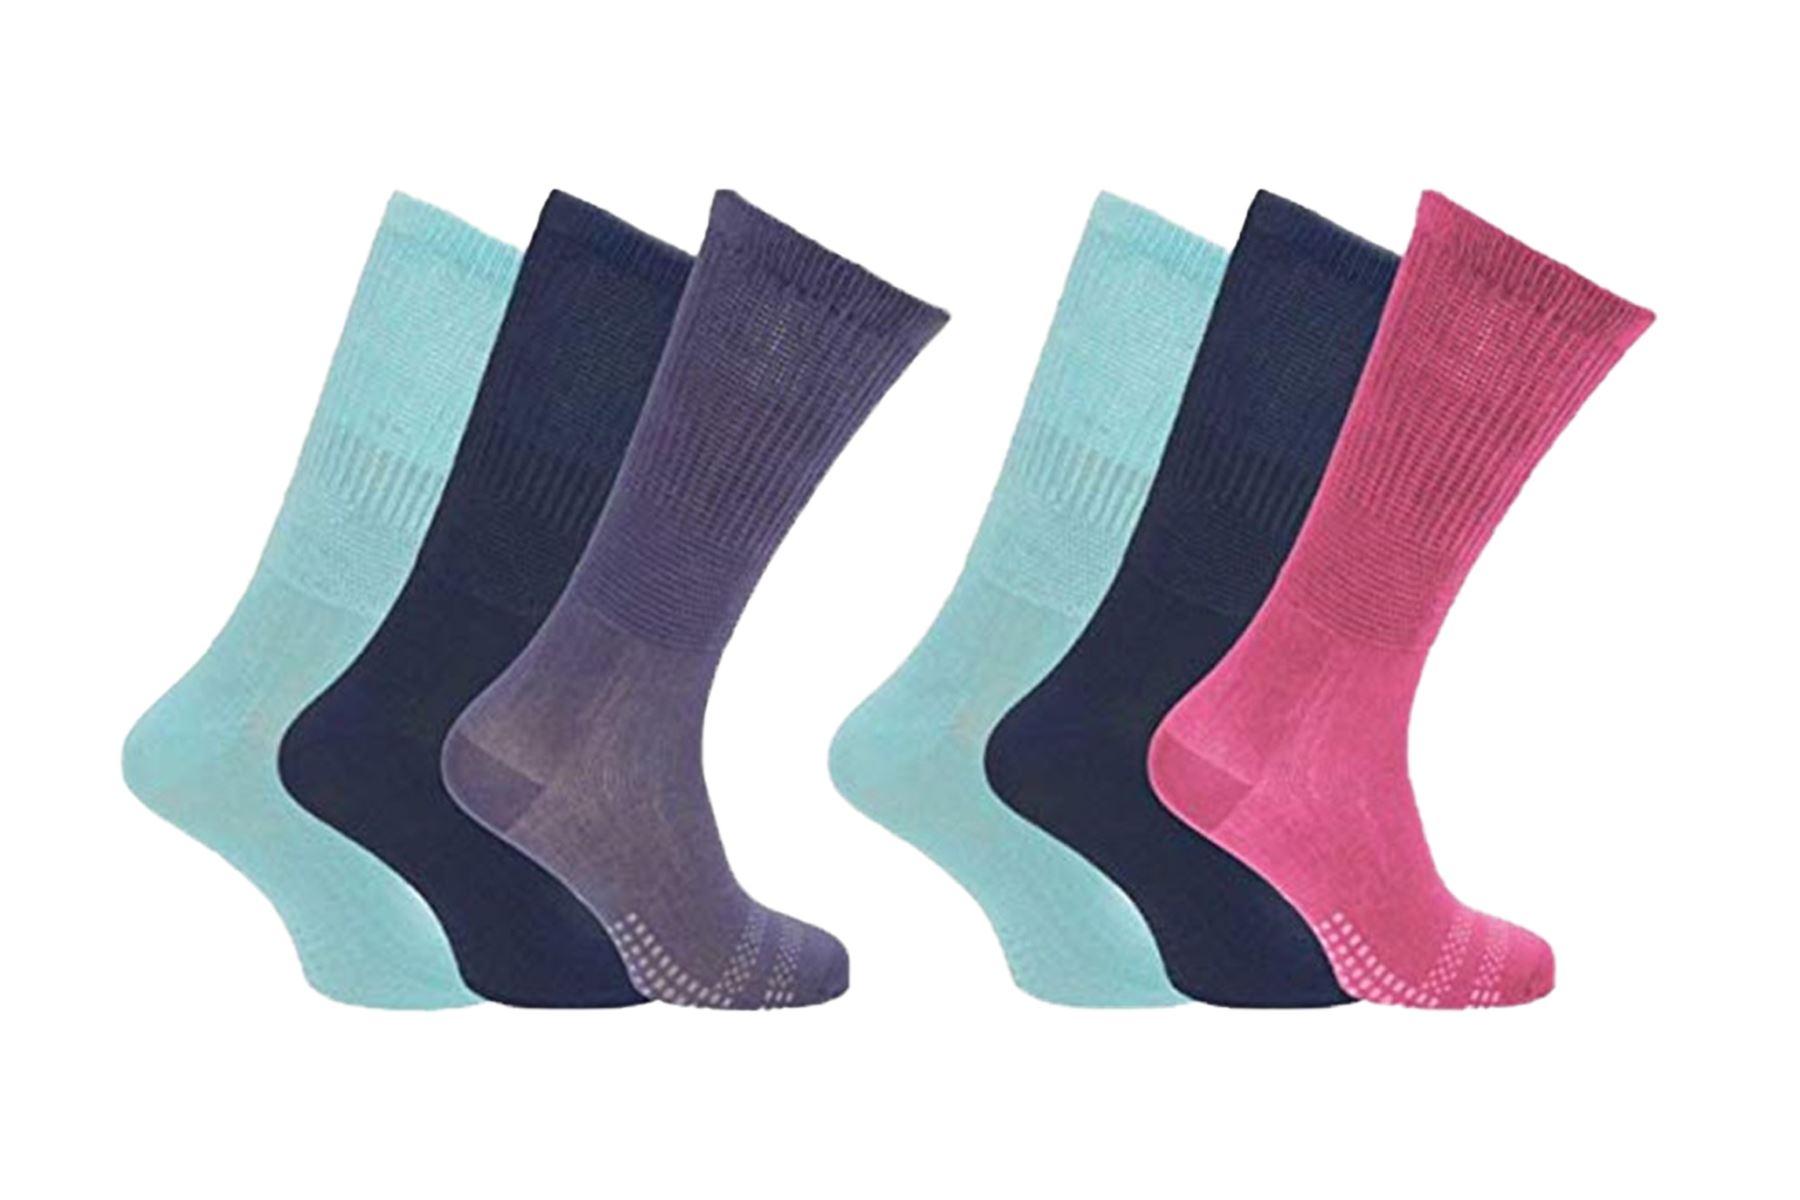 Bamboo Socks Wide Loose Top Diabetic Sock Women size 2-11 Black Navy White Grey